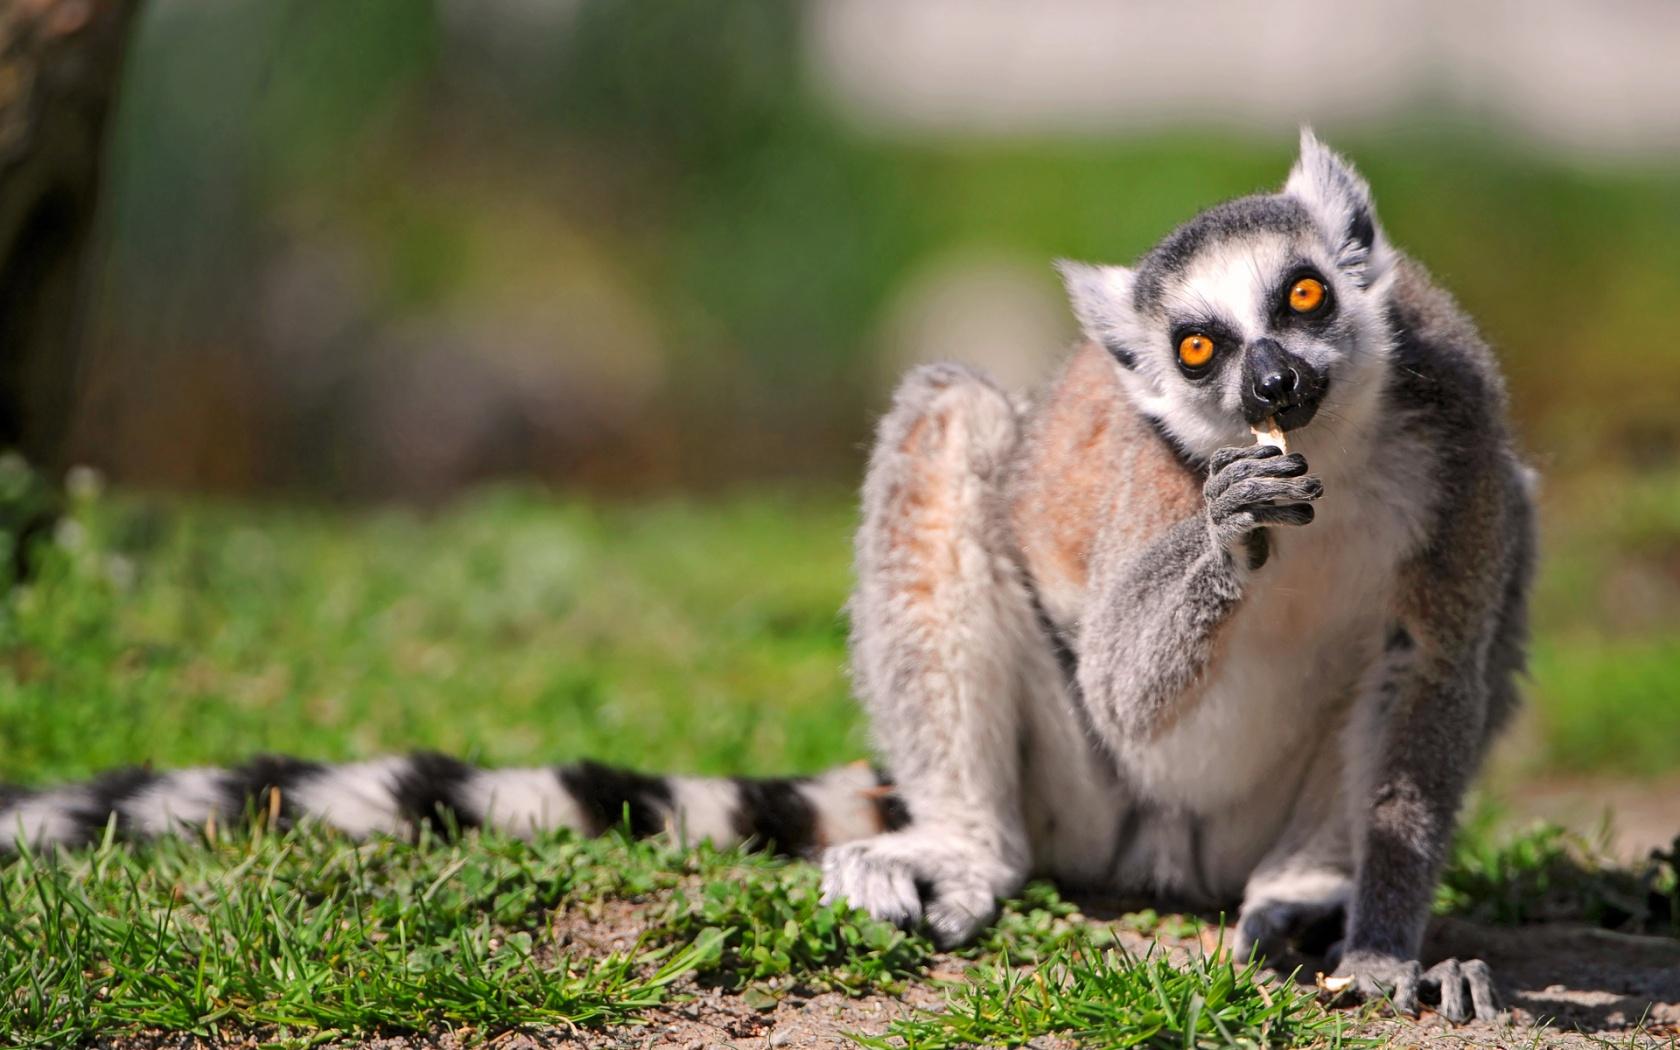 An eating ringtail lemur